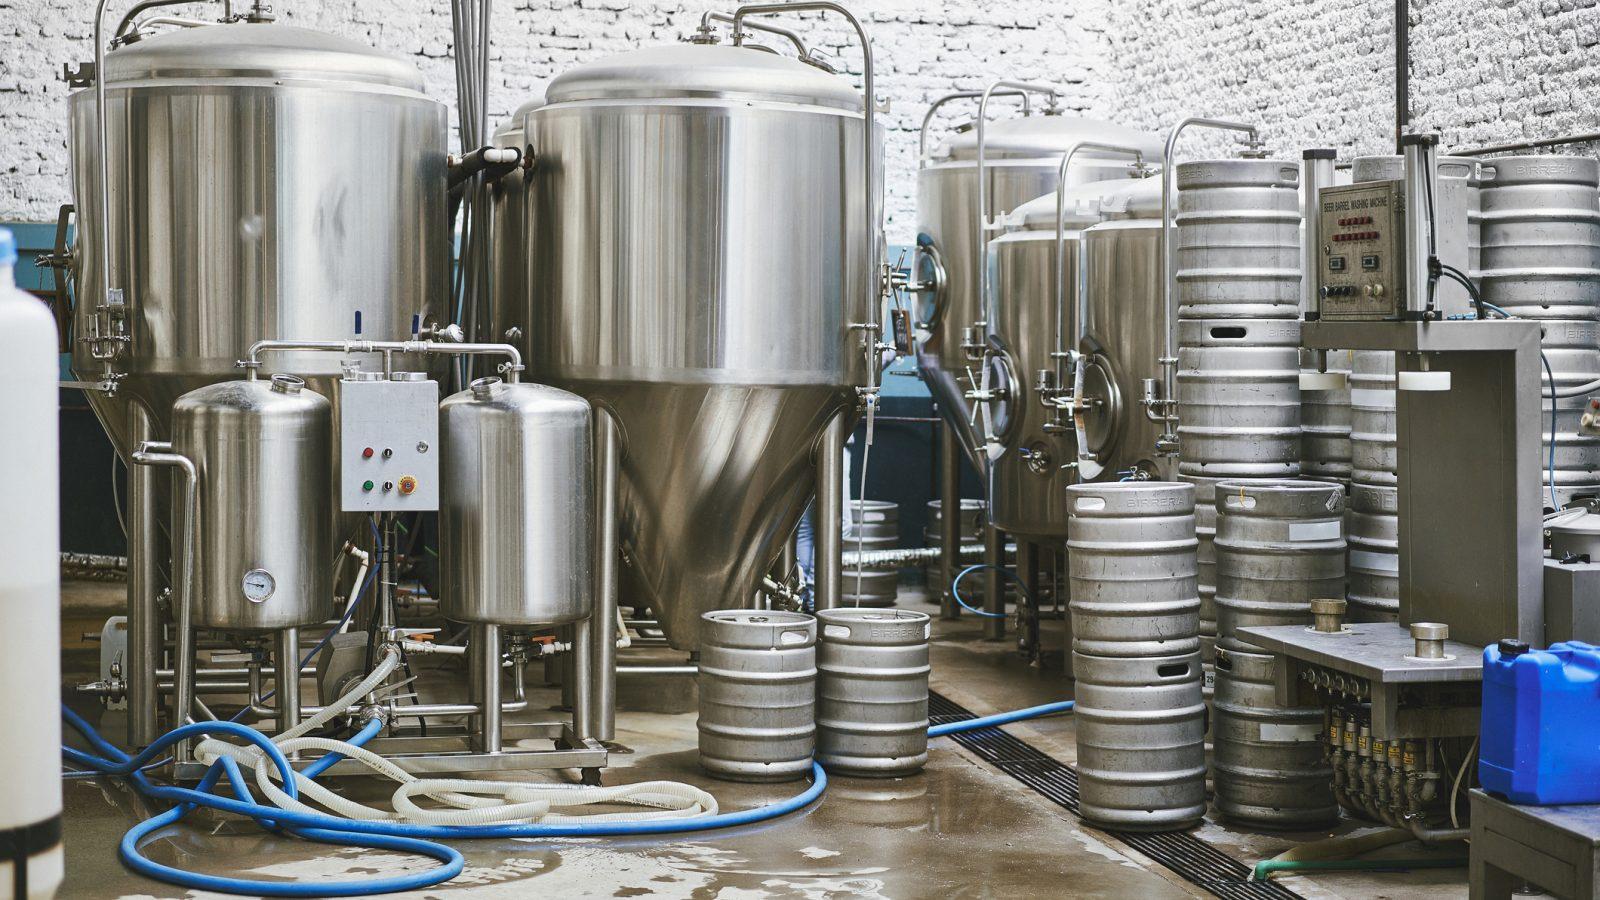 Buenos Aires Craft Beer Brewery Interior